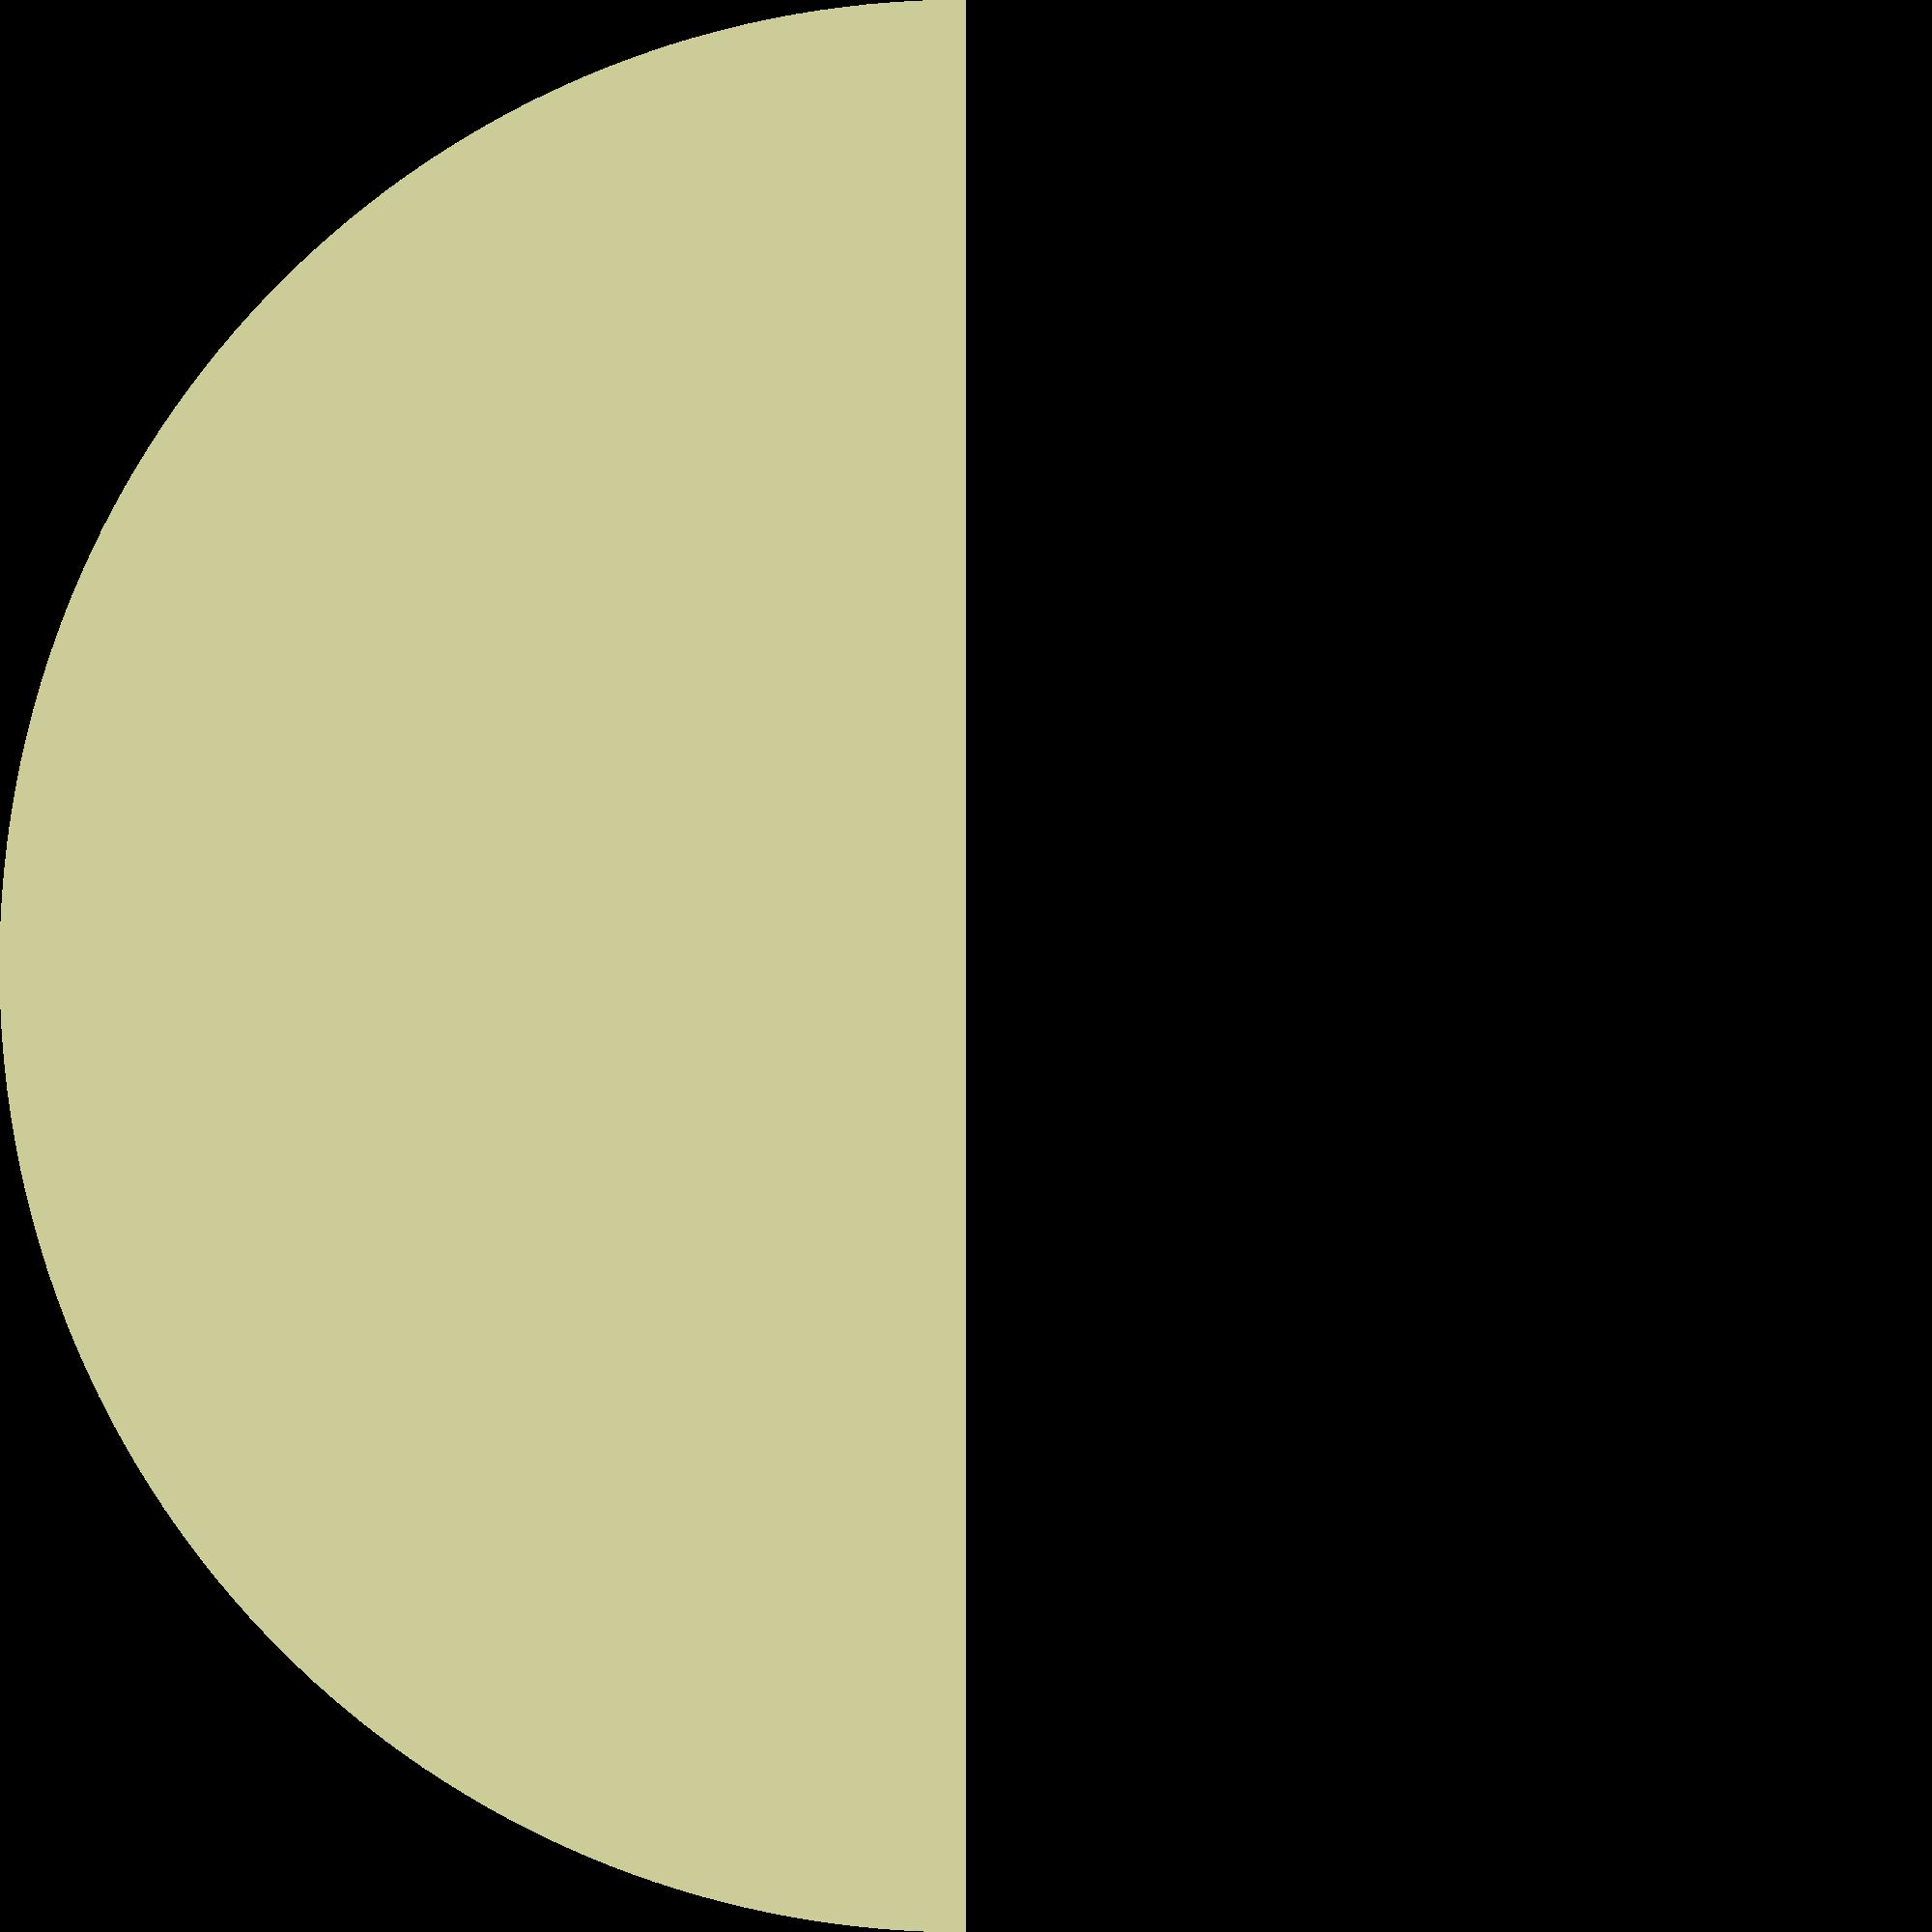 2000x2000 Fileleft Half Moon Drawing.svg